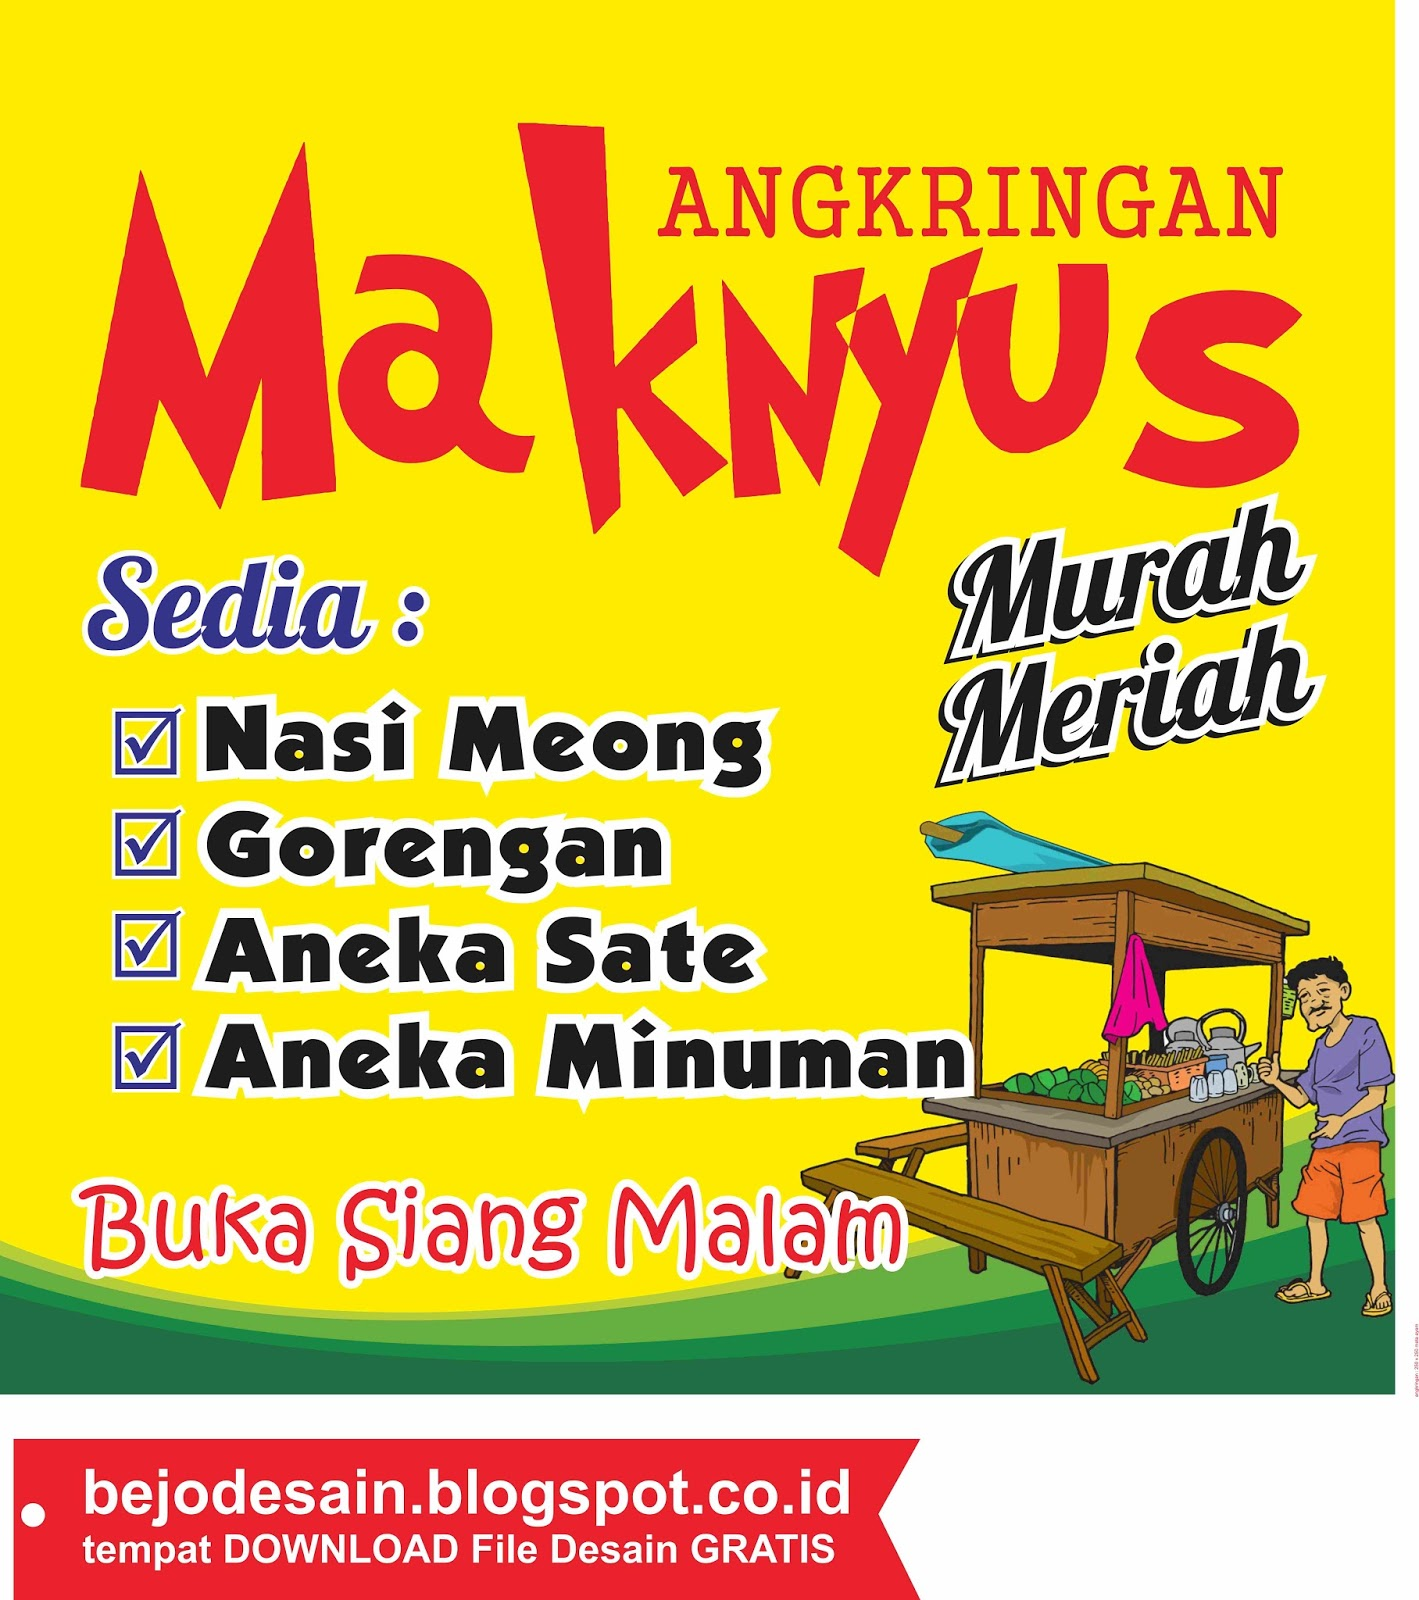 Contoh Banner Desain Banner Angkringan Keren - Crimealirik ...